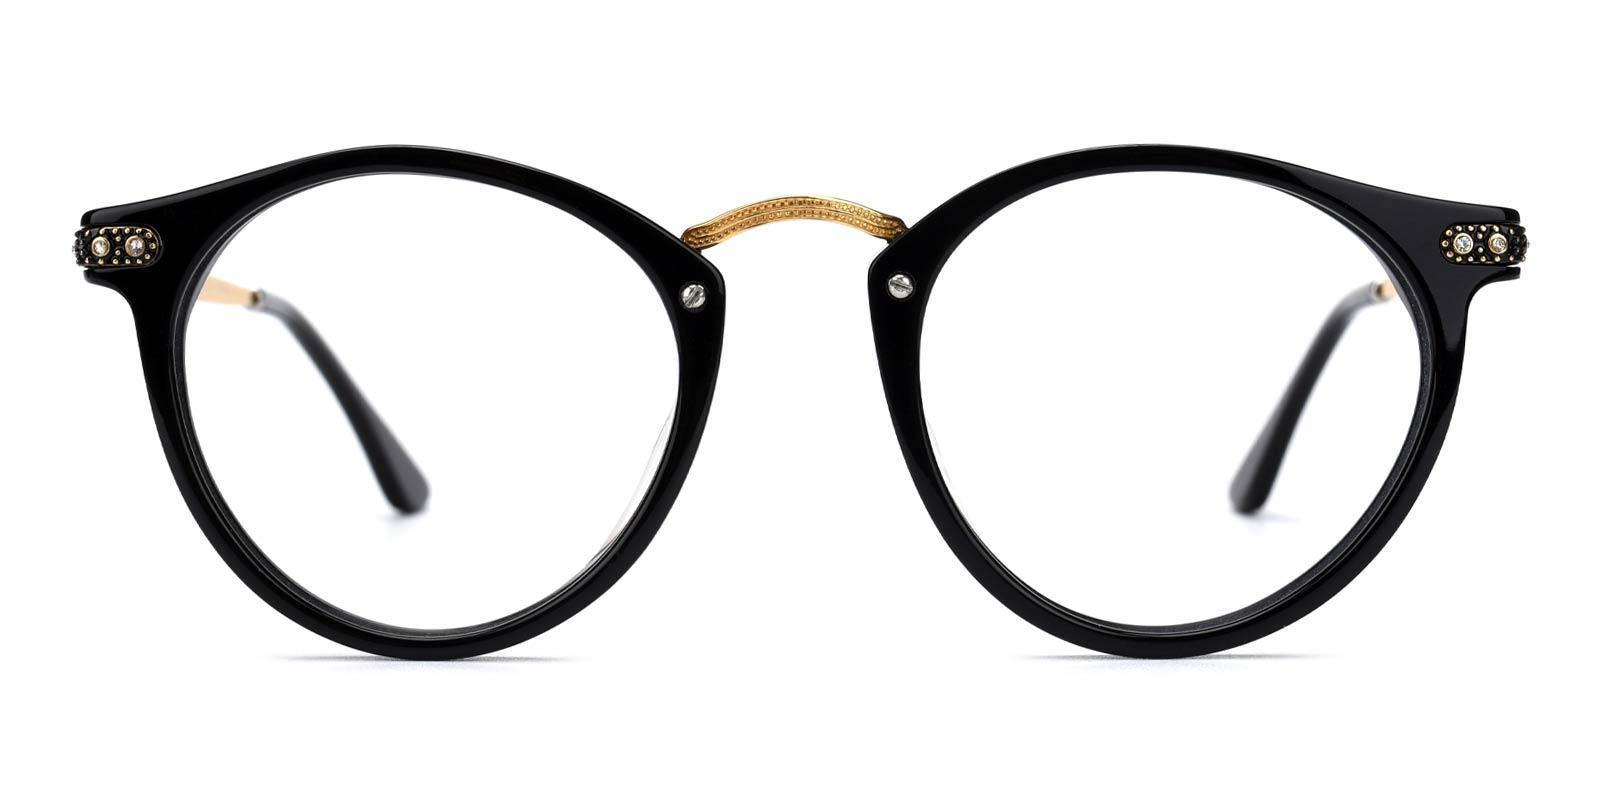 Donna-Black-Round-Acetate-Eyeglasses-additional2